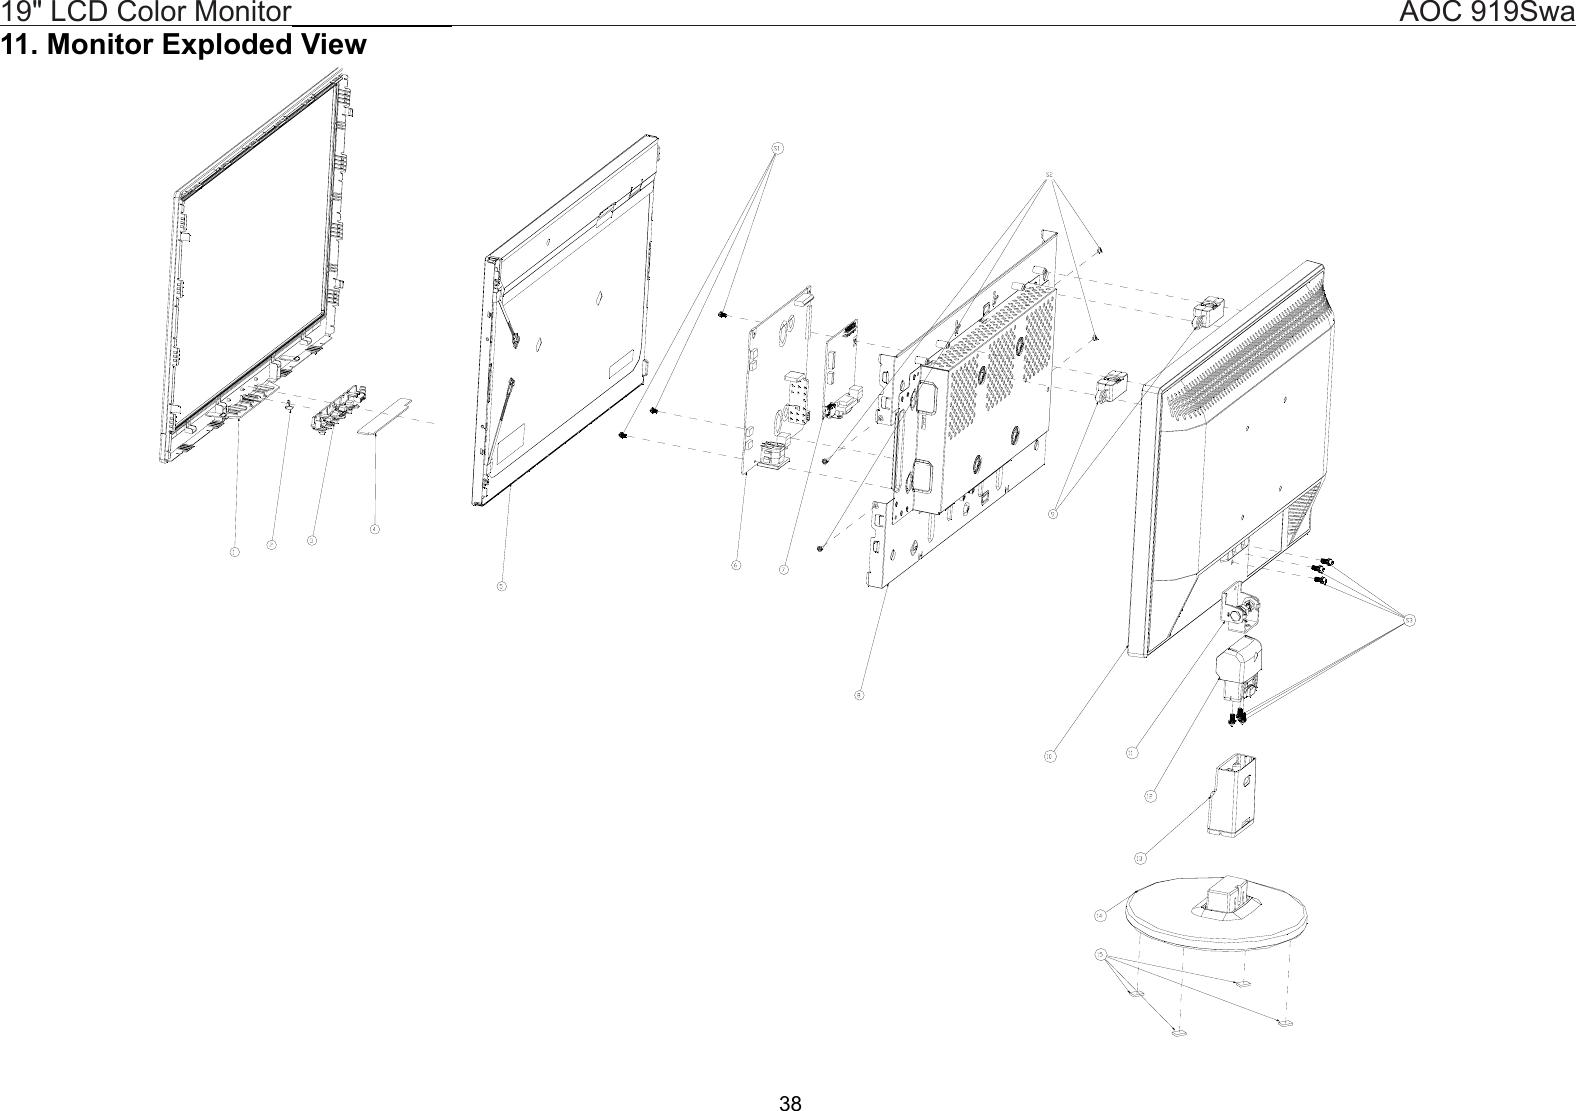 Aoc 919Swa Users Manual Monitor User Guide Operating ... on